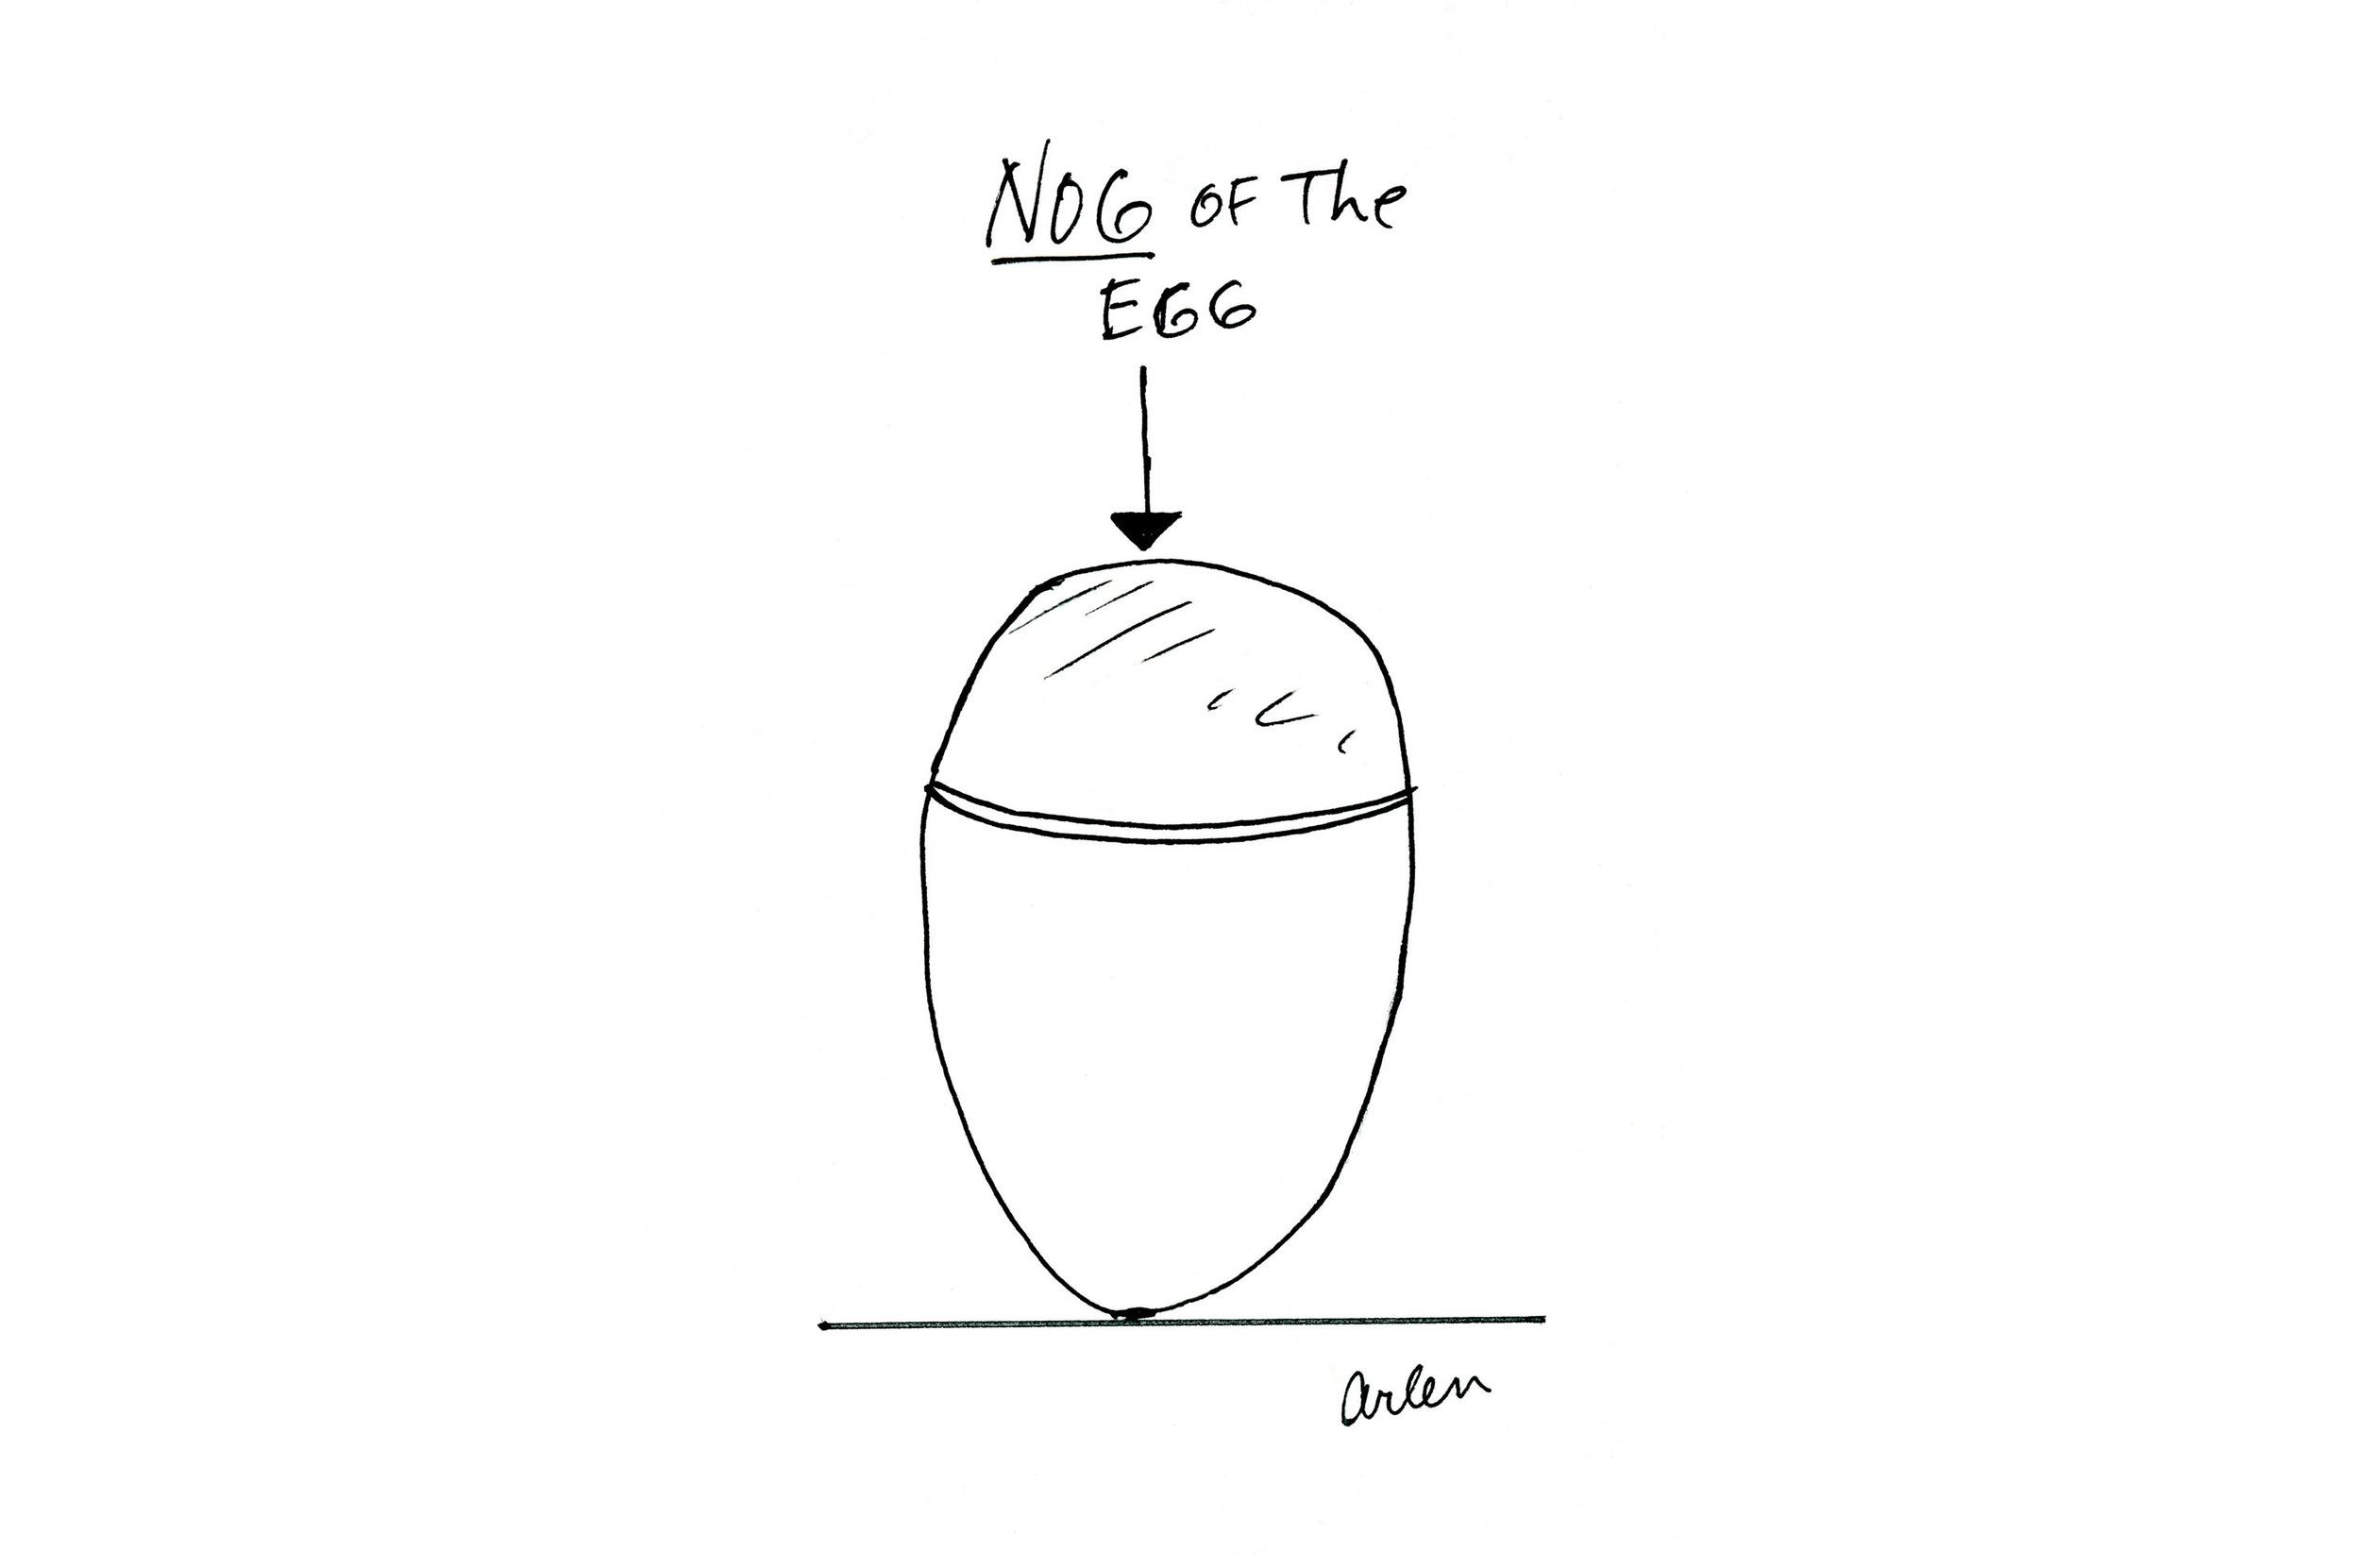 gllry_43-Nog-of-the-Egg_same-sz.jpg